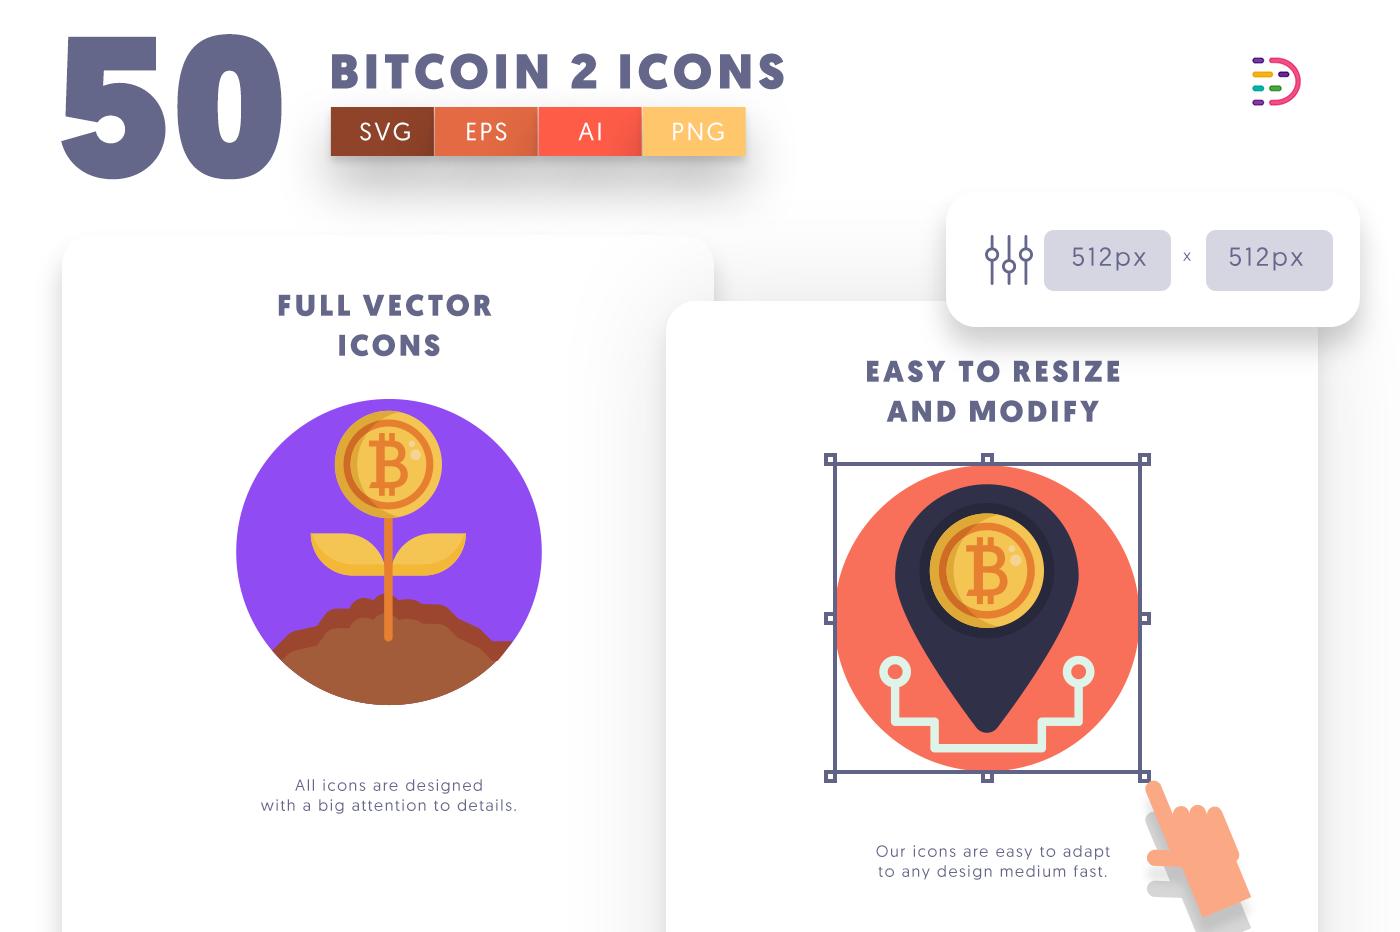 Full vector 50Bitcoin2 Icons